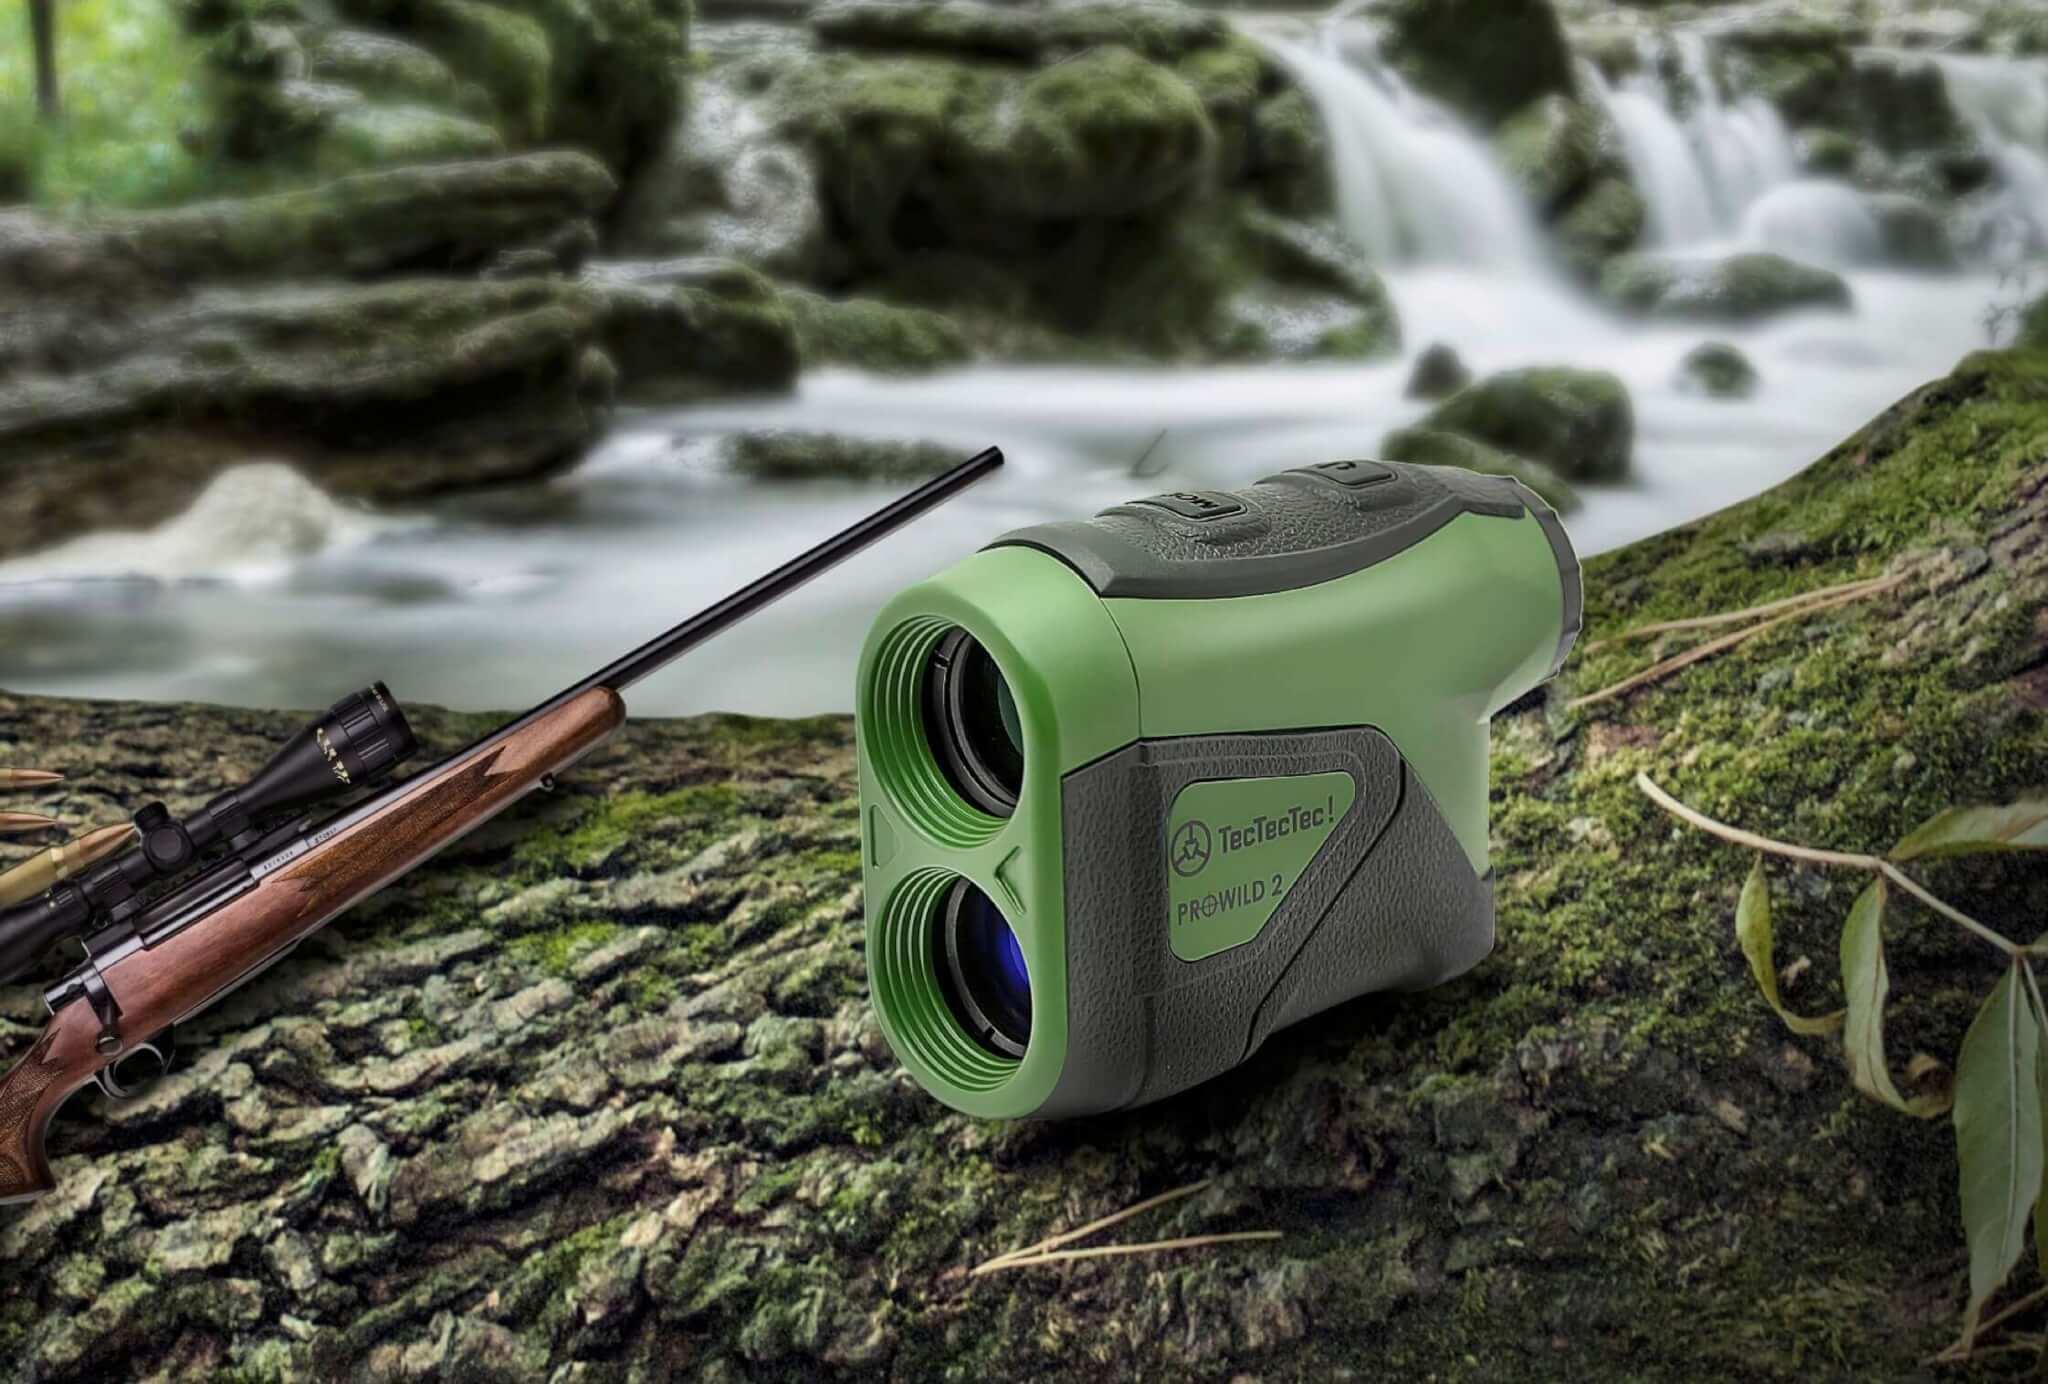 TecTecTec-Prowild-2-Hunting-rangefinder-0.3-Accuracy